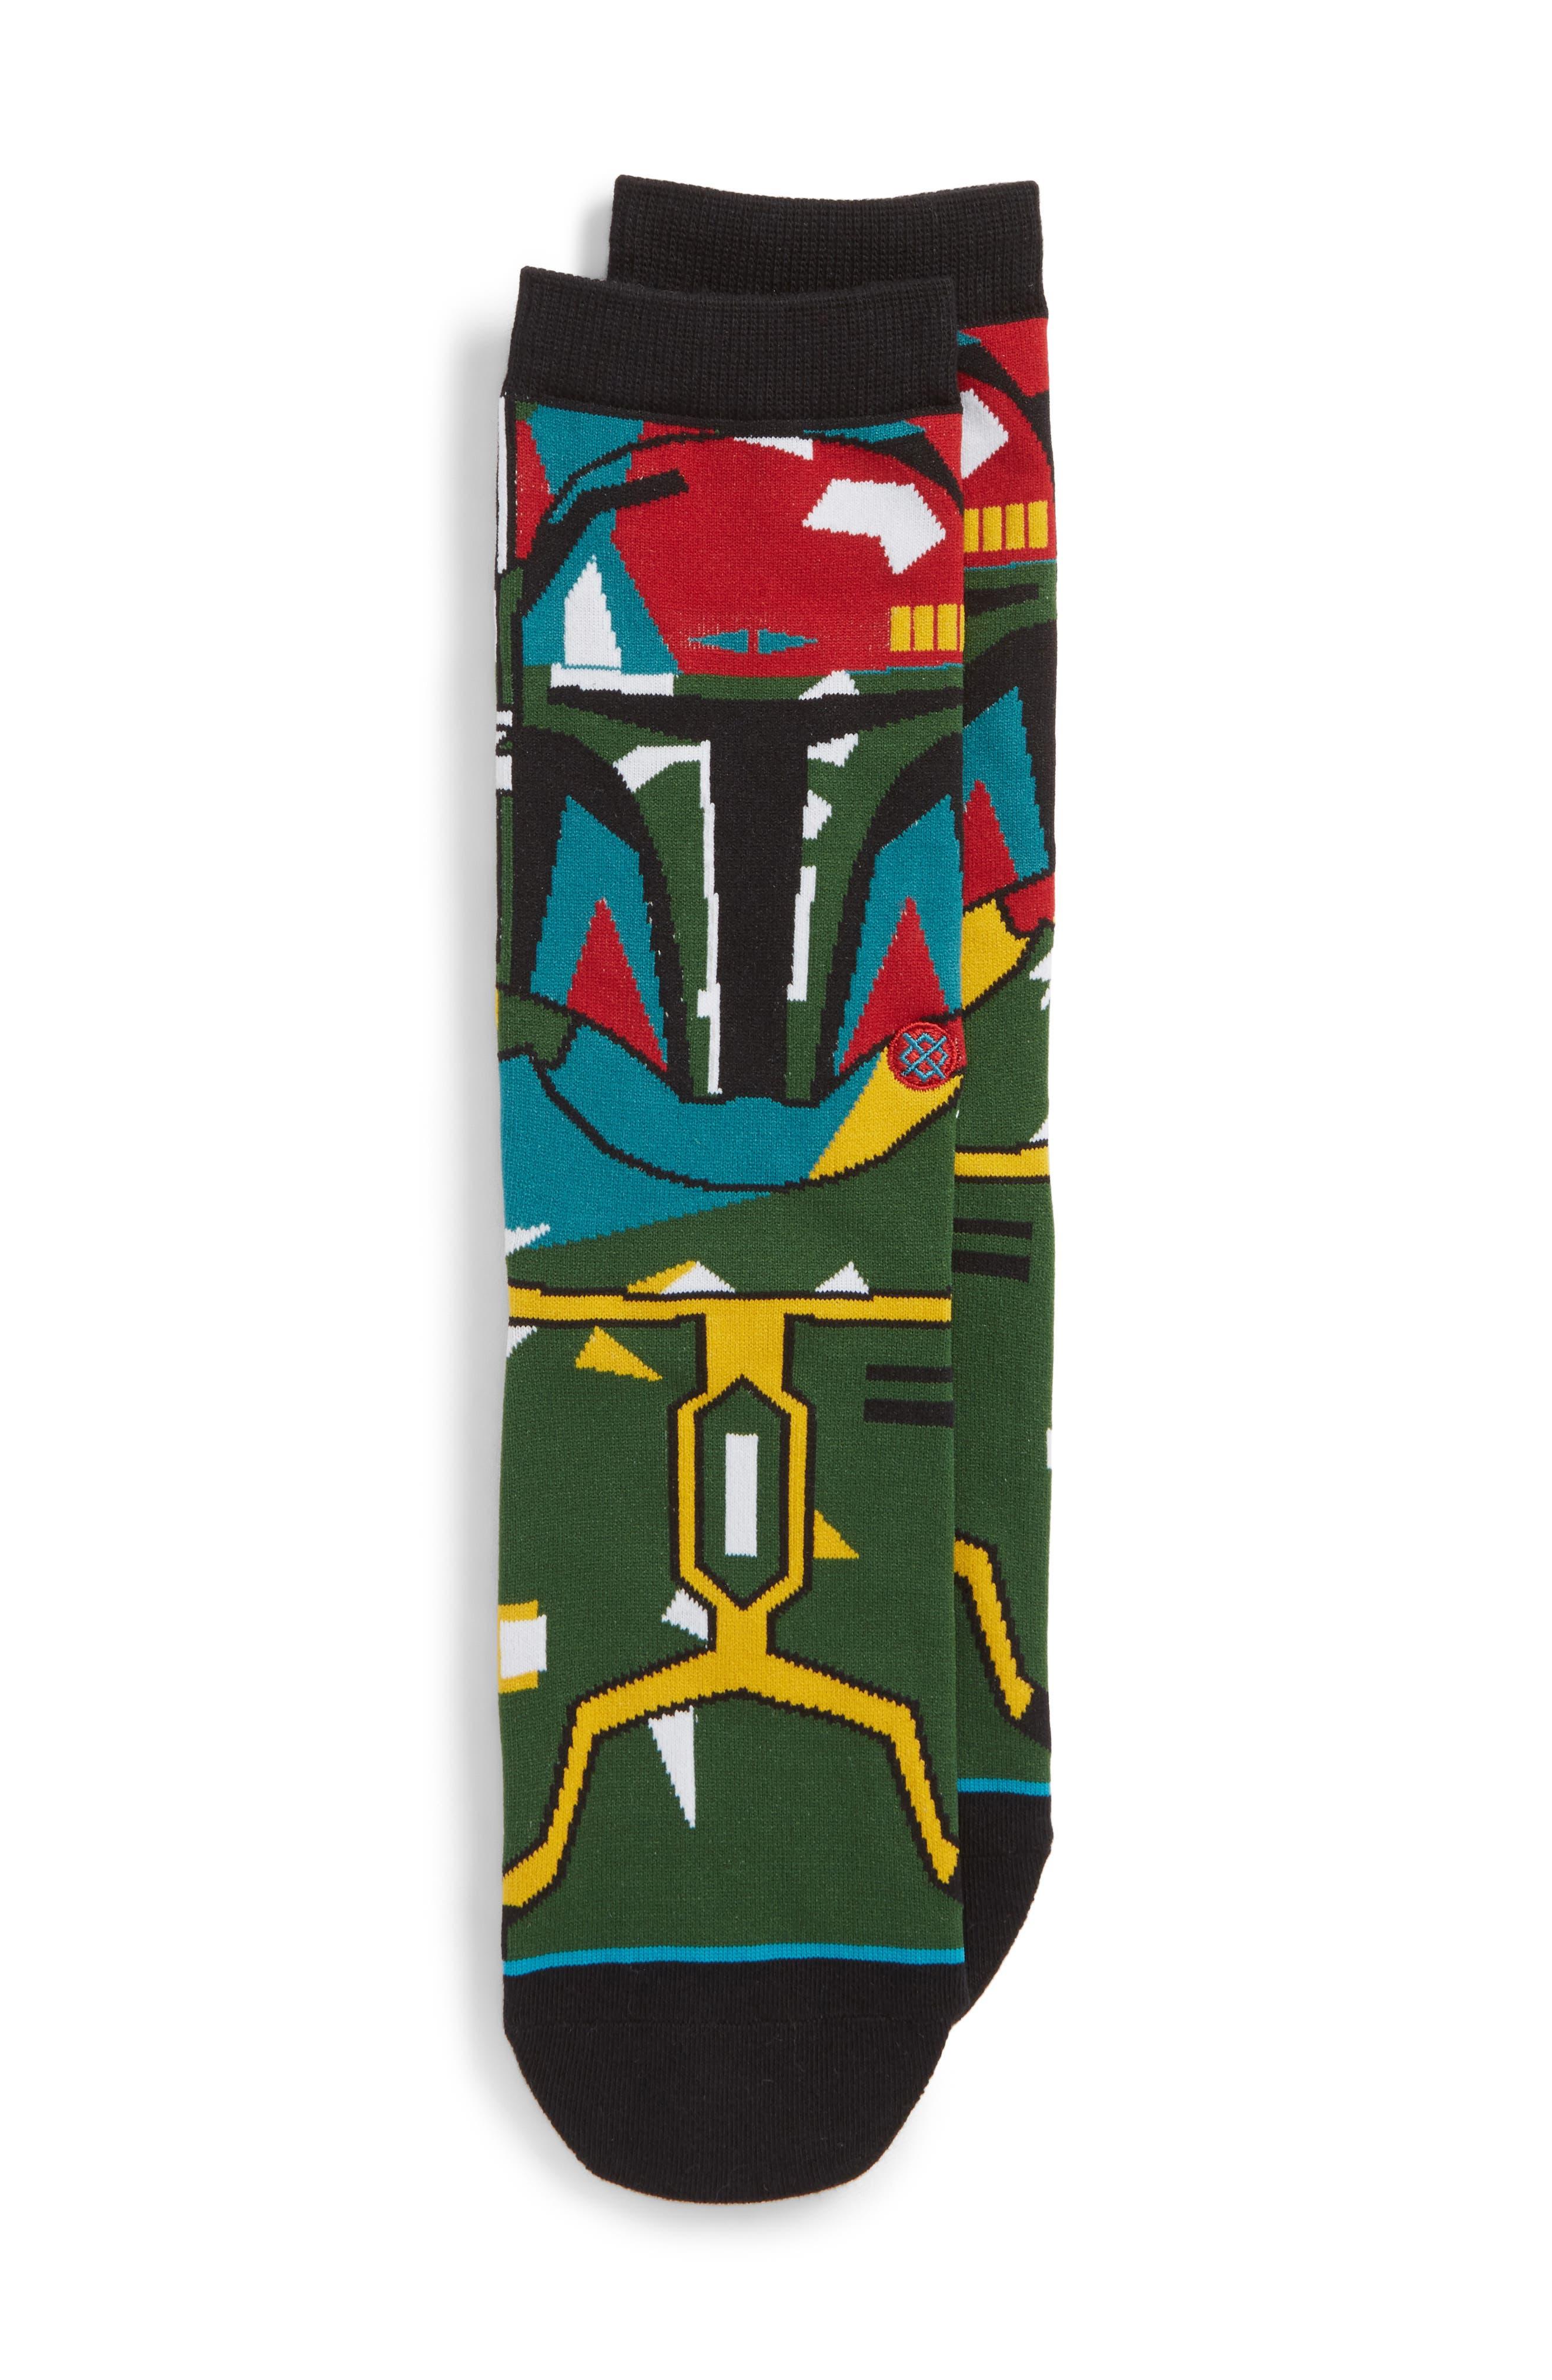 Alternate Image 1 Selected - Stance x Star Wars Boba Mosaic Socks (Kids)